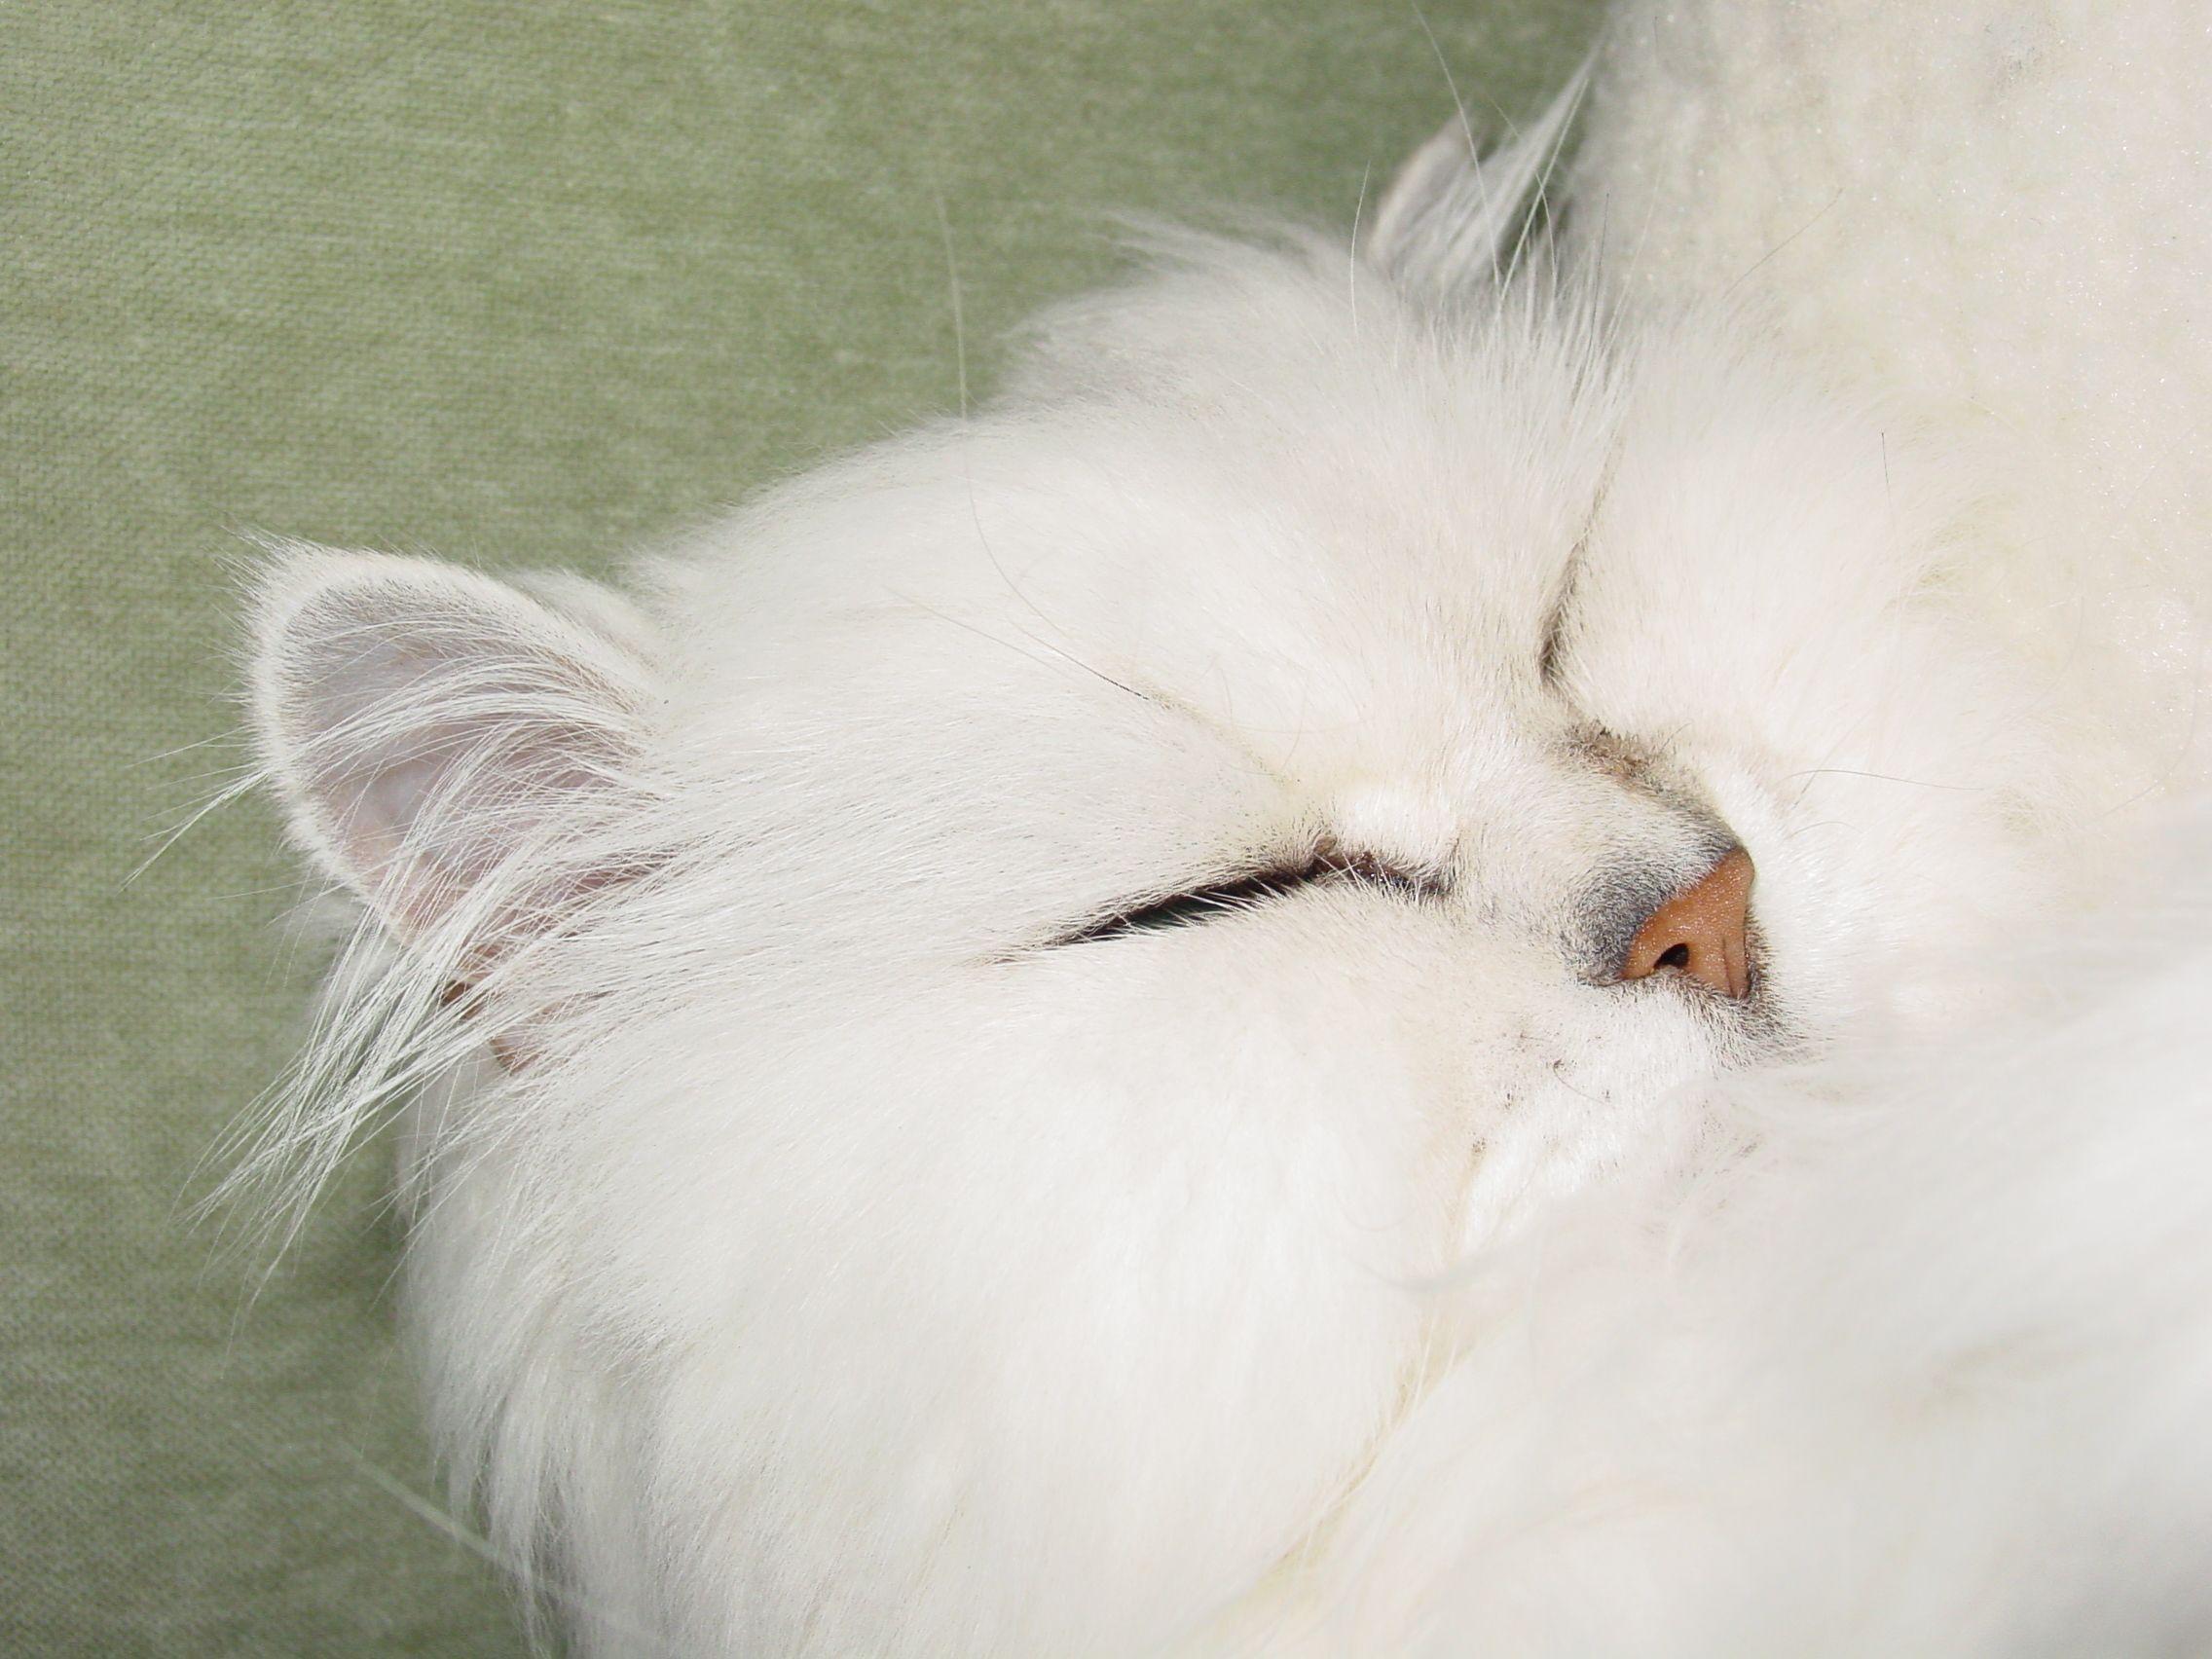 Ium sound asleep so donut wake me up